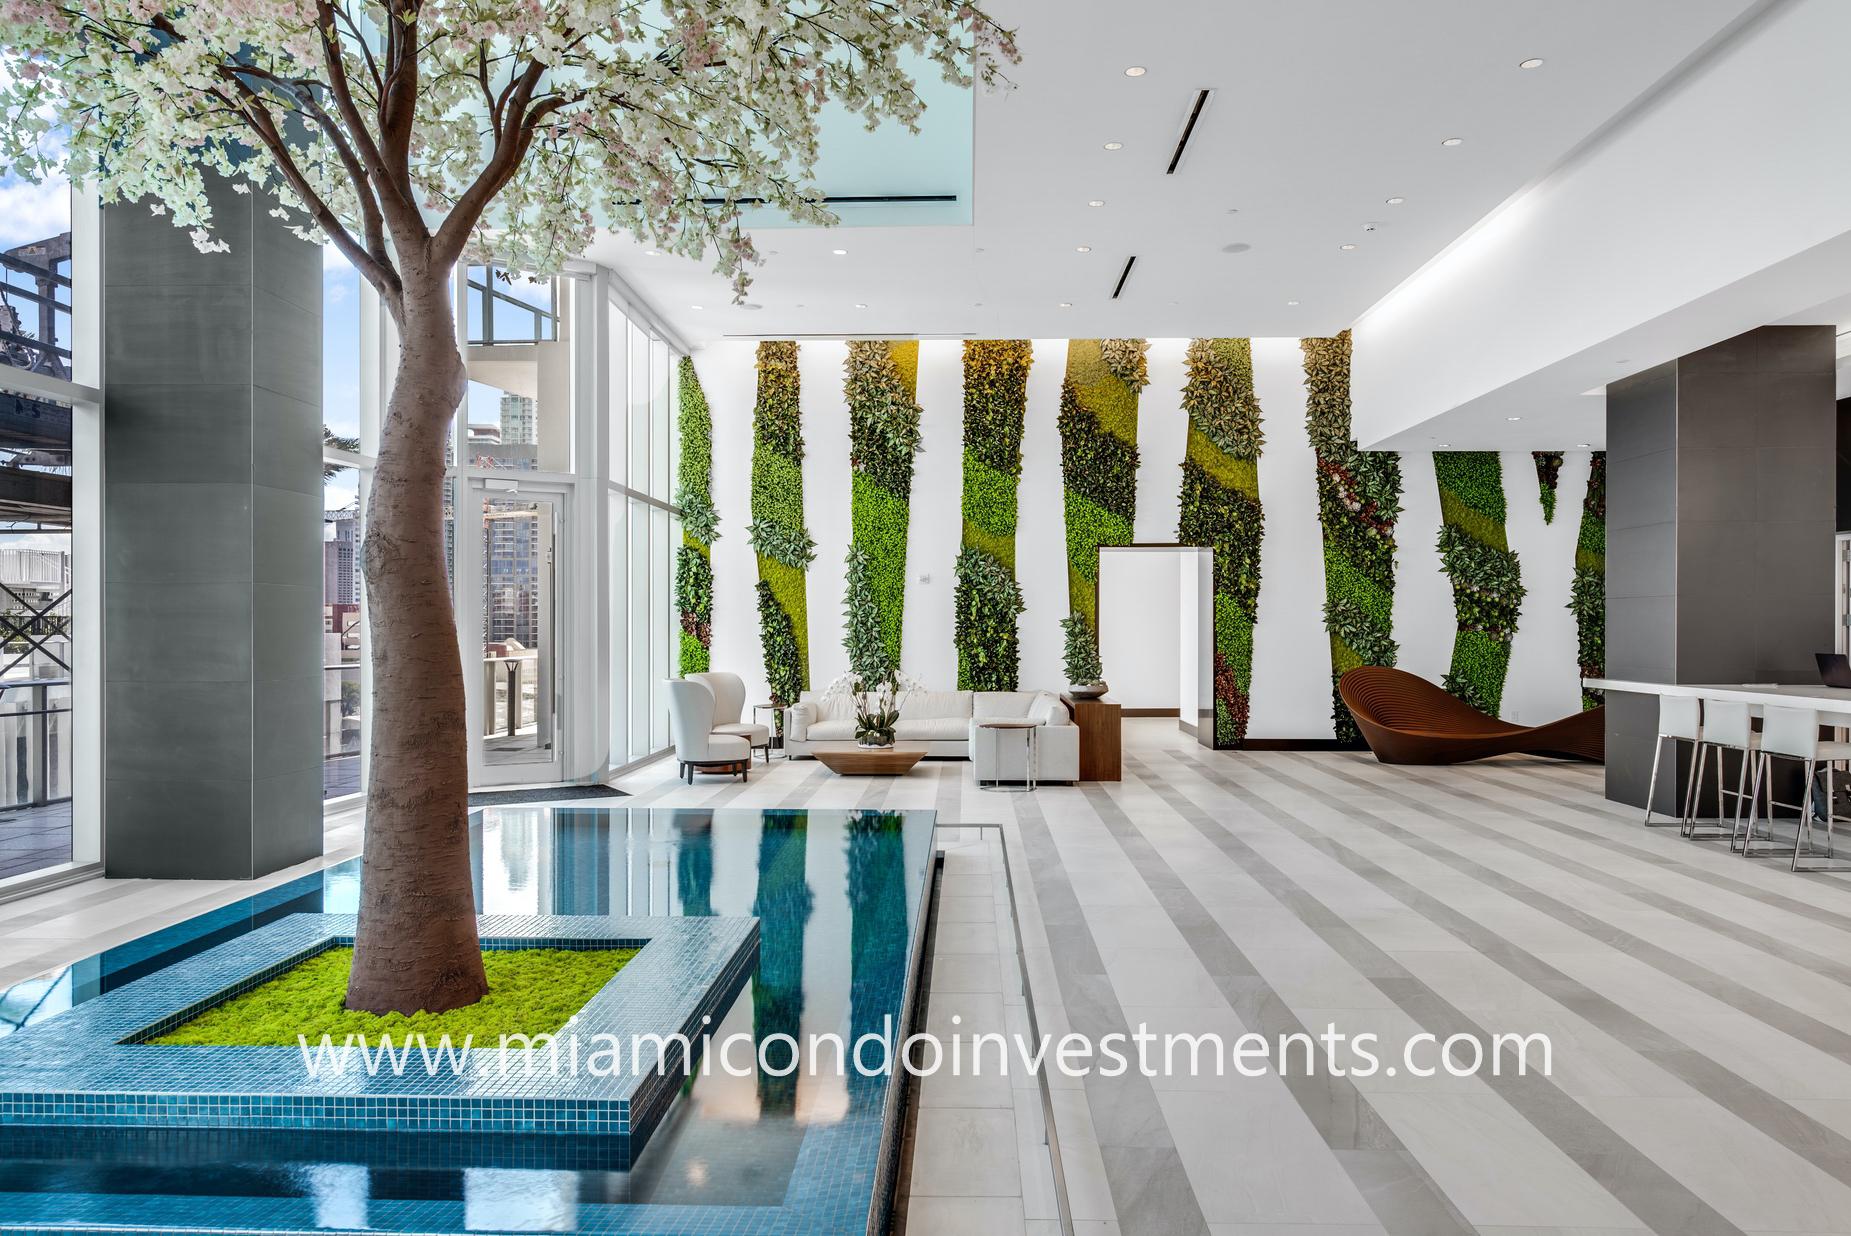 Paramount Miami conservatory